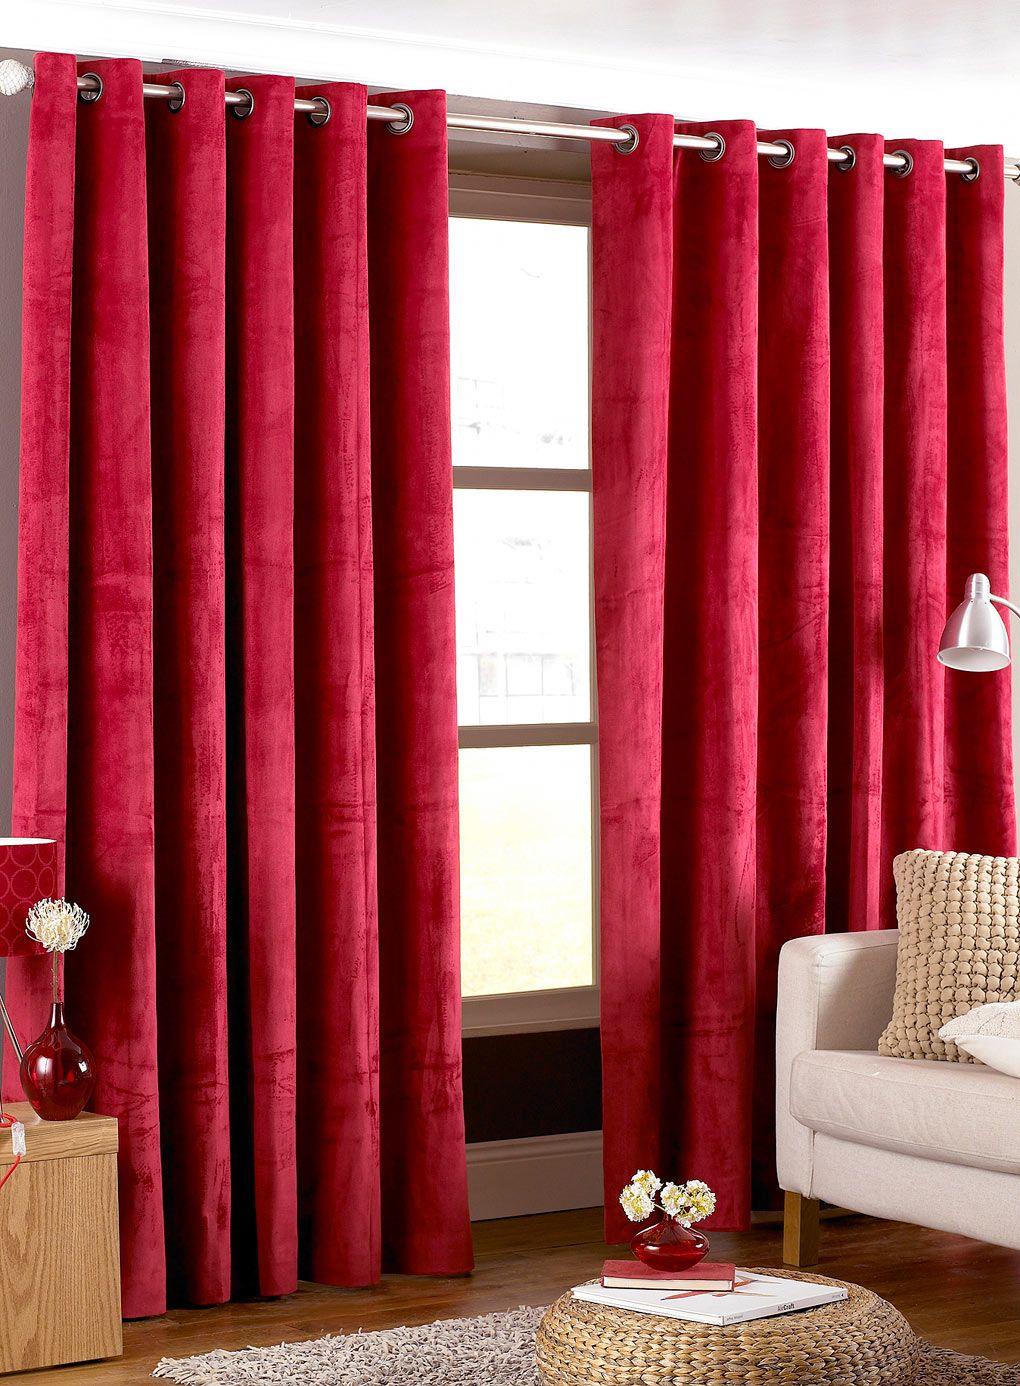 20 Hottest Curtain Design Ideas For 2020 Pouted Com Curtains Living Room Red Curtains Living Room Curtain Designs #red #and #grey #curtains #for #living #room